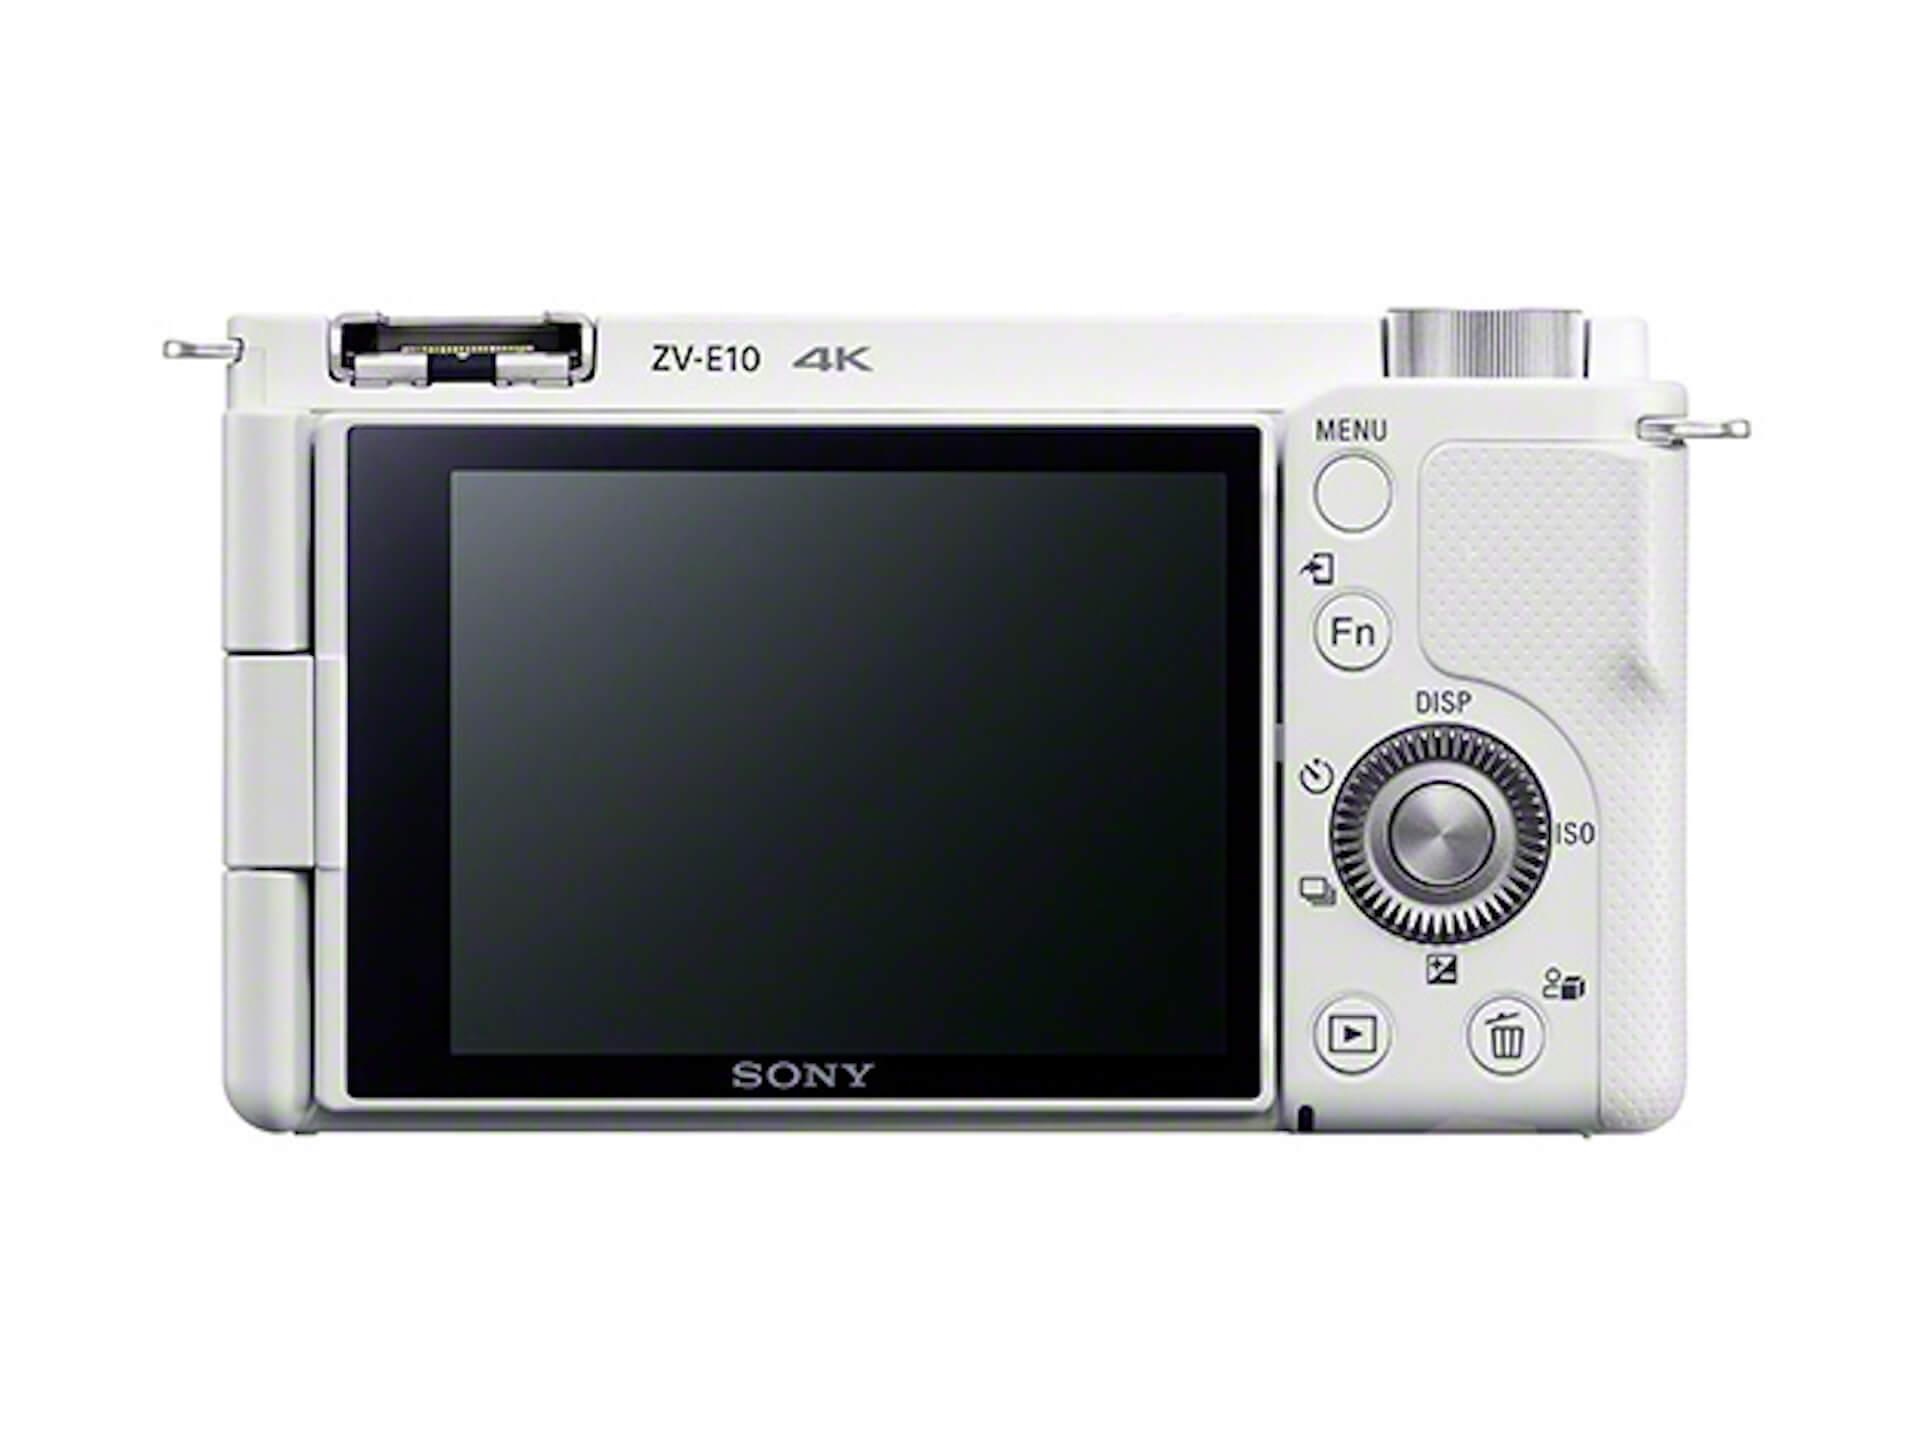 SONYからVlog撮影に特化したαTMシリーズ初のレンズ交換式カメラ「VLOGCAMTM ZV-E10」が発売! tech_210729_sonyvlogcam4